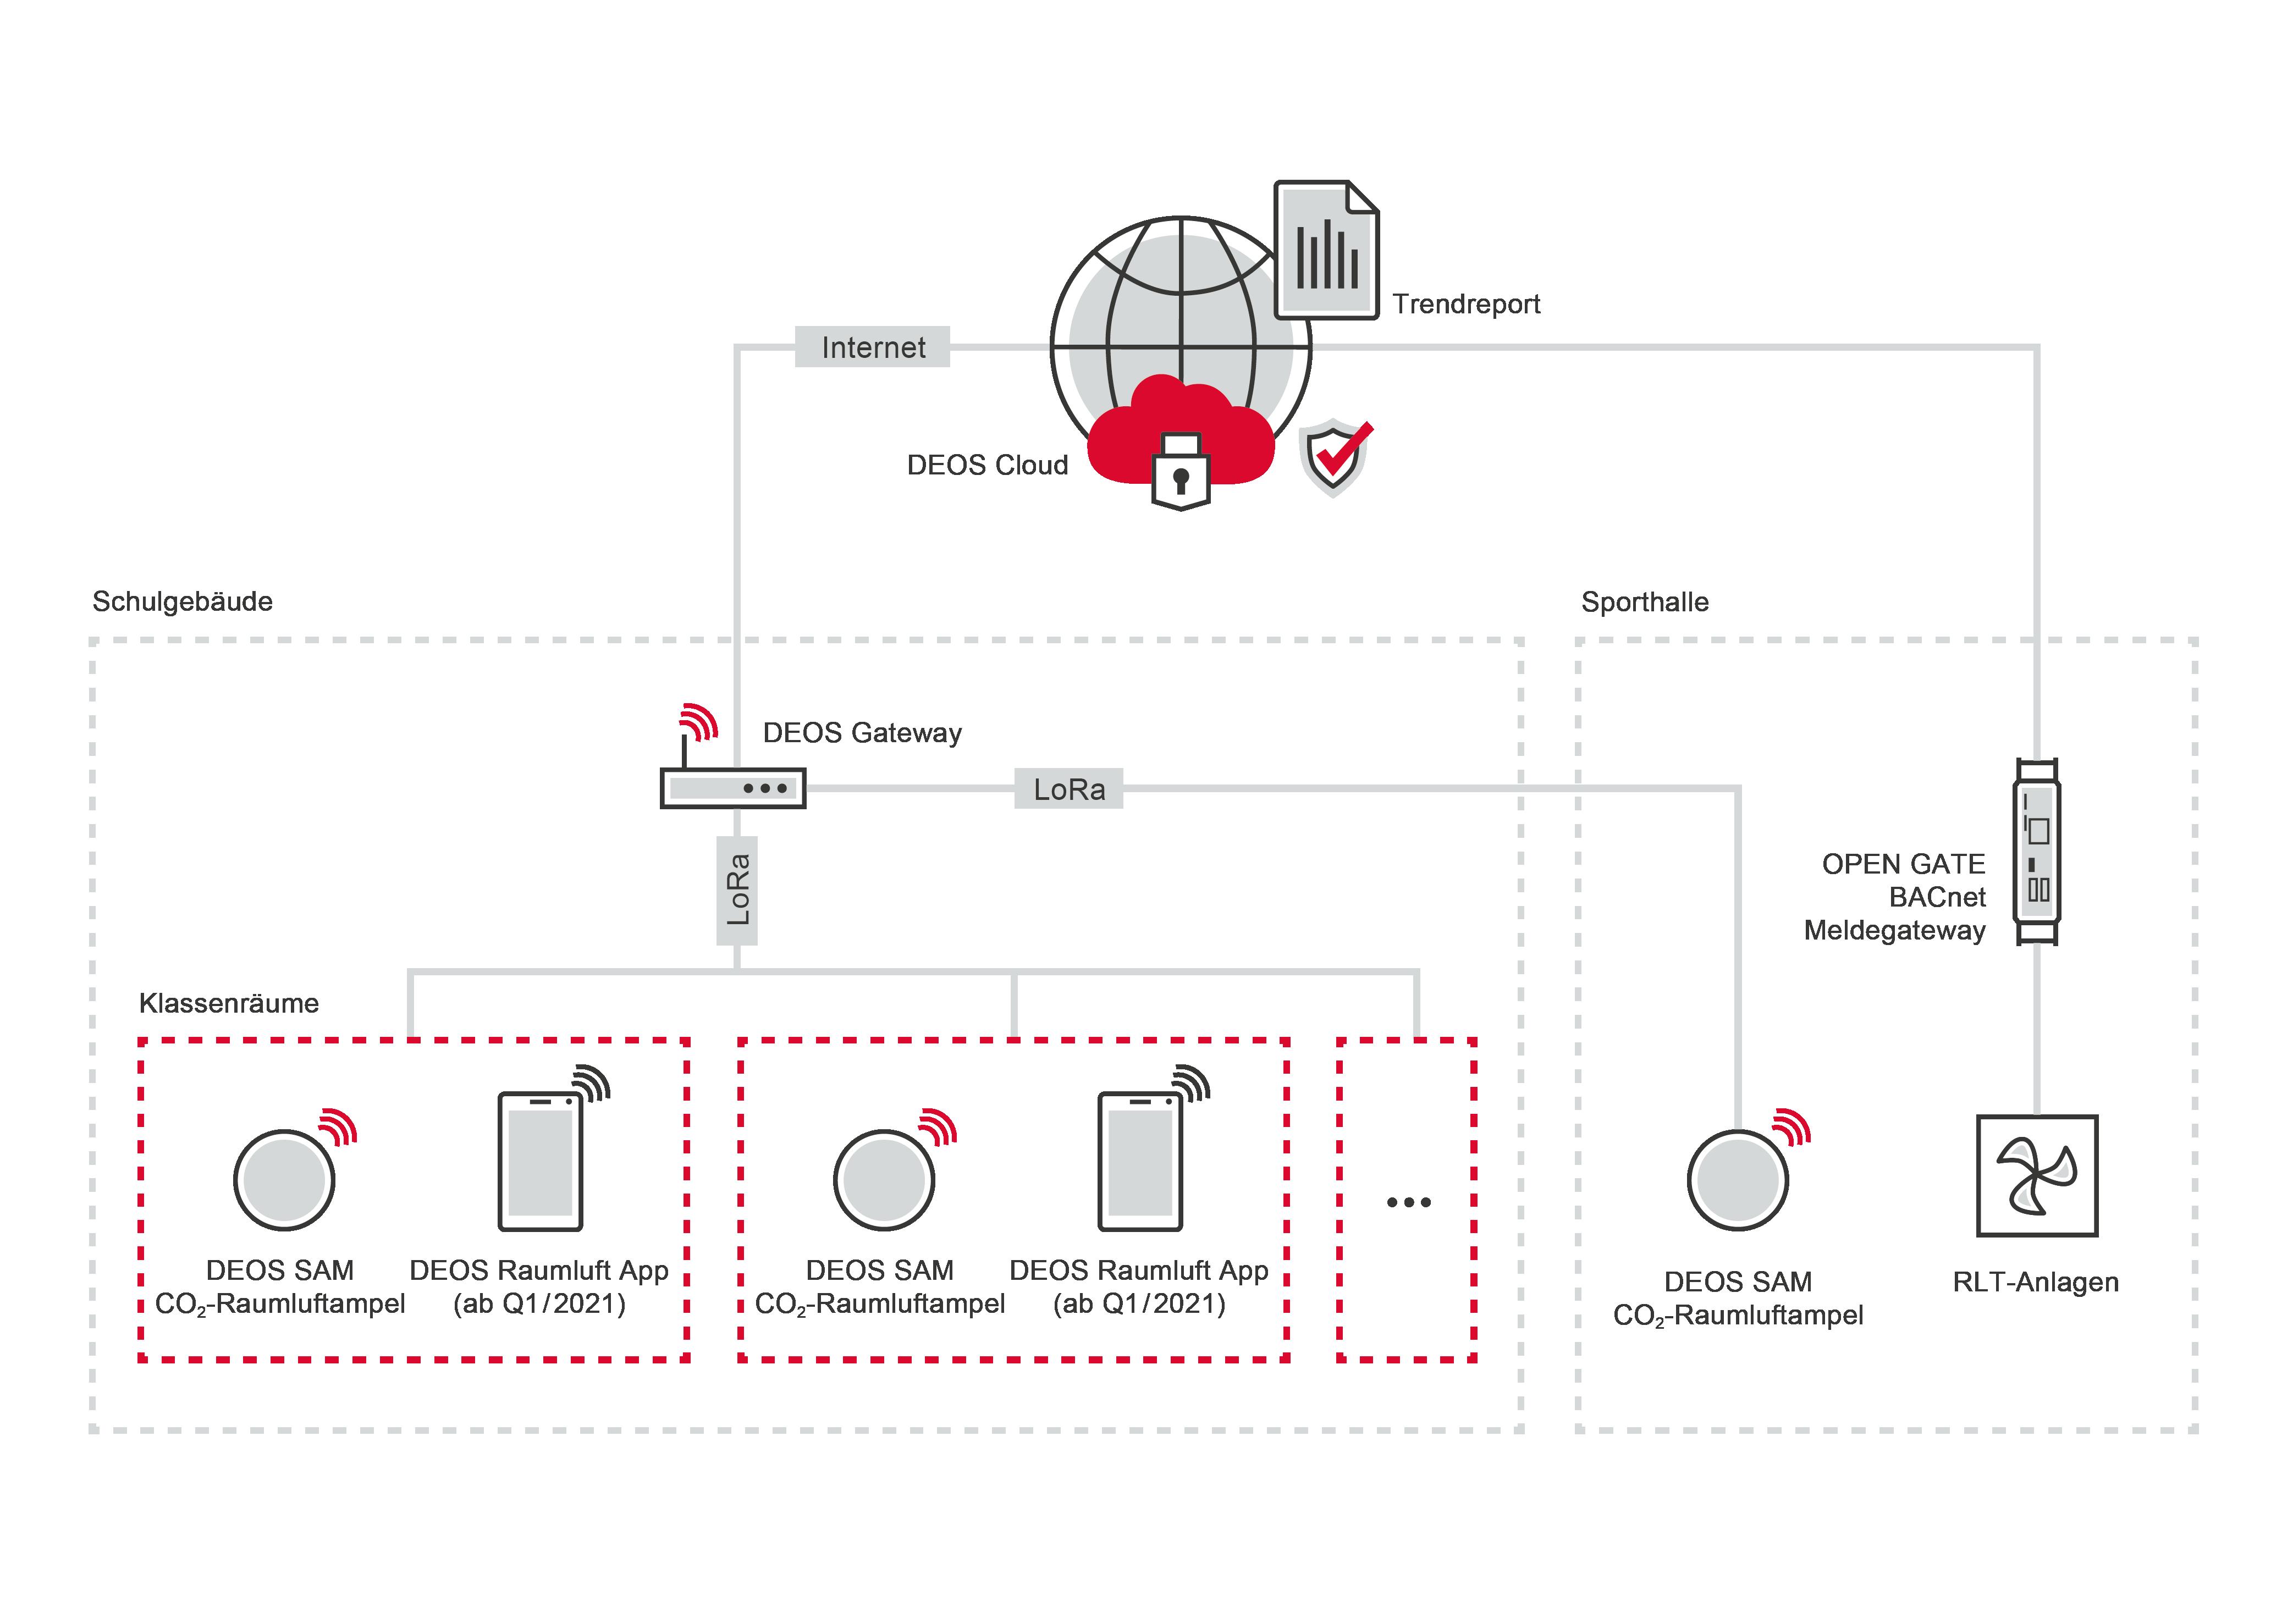 DEOS SAM CO2-Raumluftampel